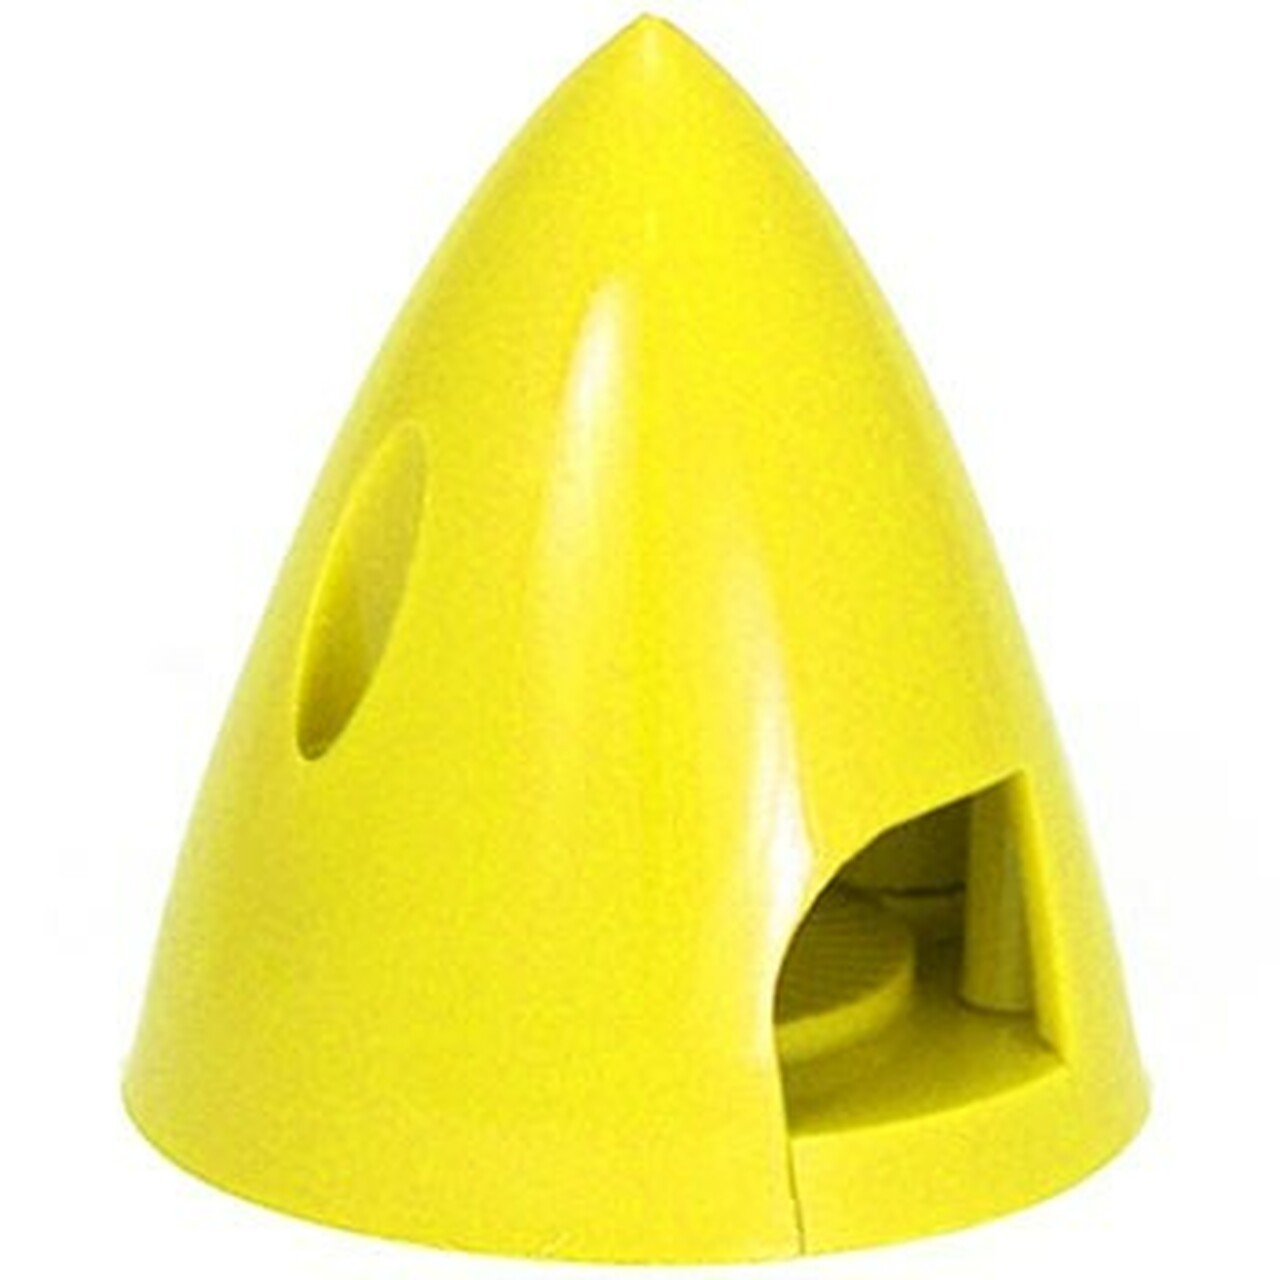 Spinner - 38mm (1-1/2in) Yellow - (DU-263)